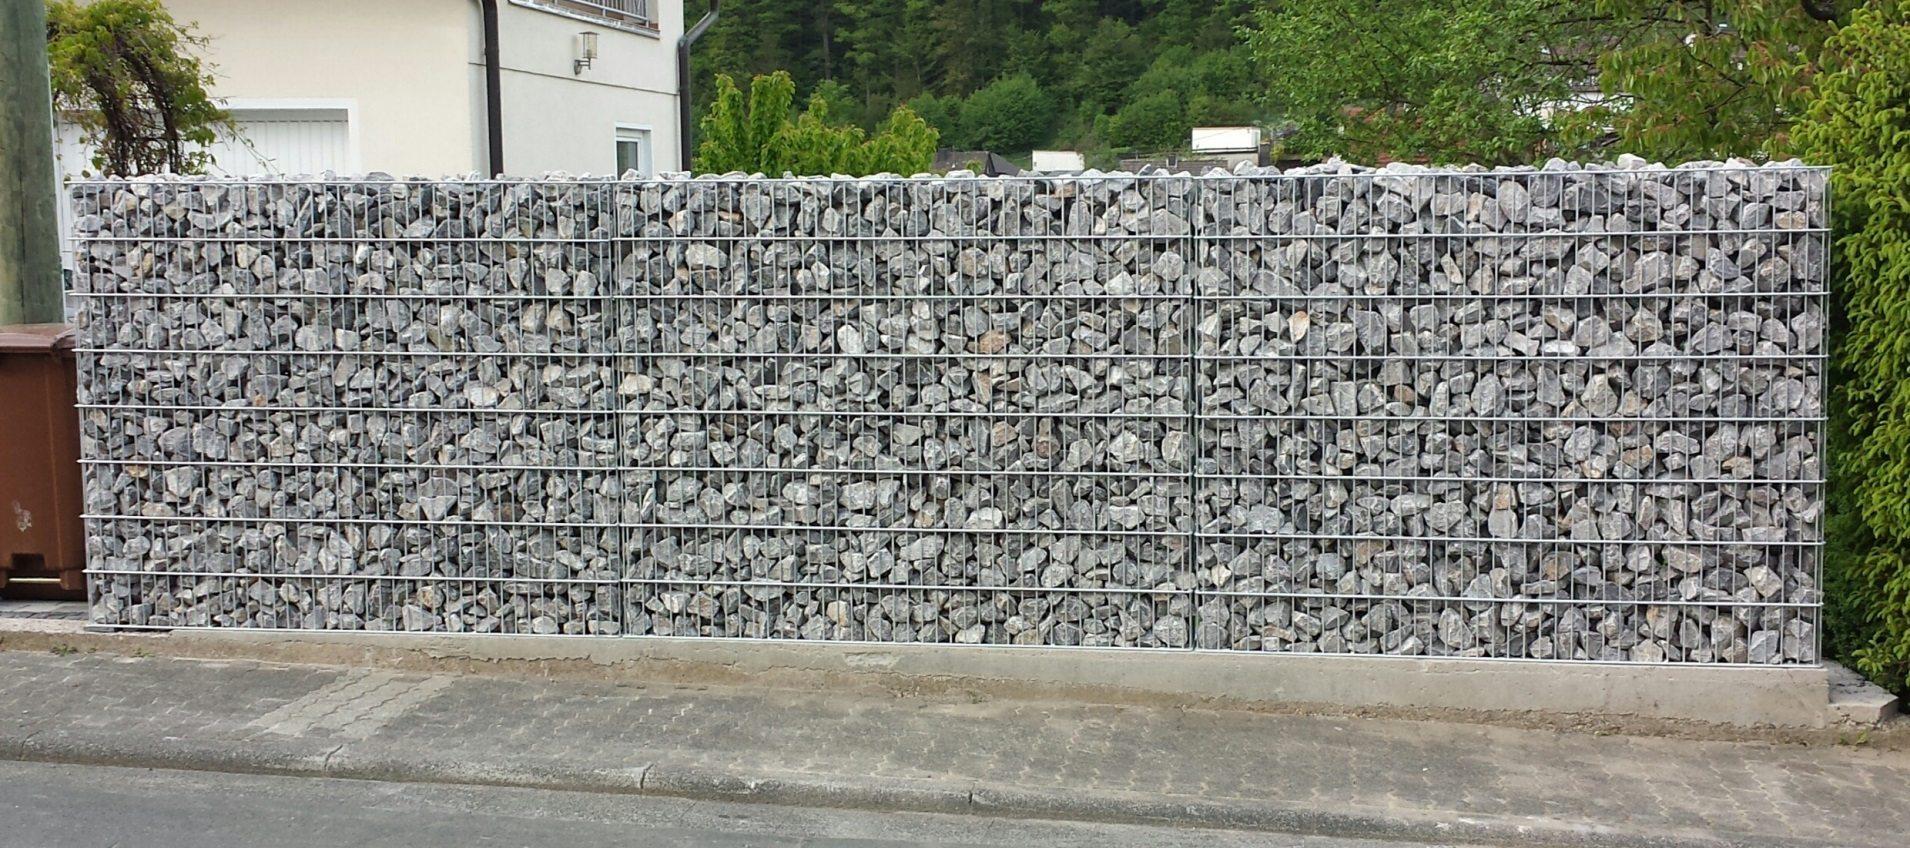 Berühmt 6x6 Geschweißter Draht Stoff Fotos - Elektrische Schaltplan ...